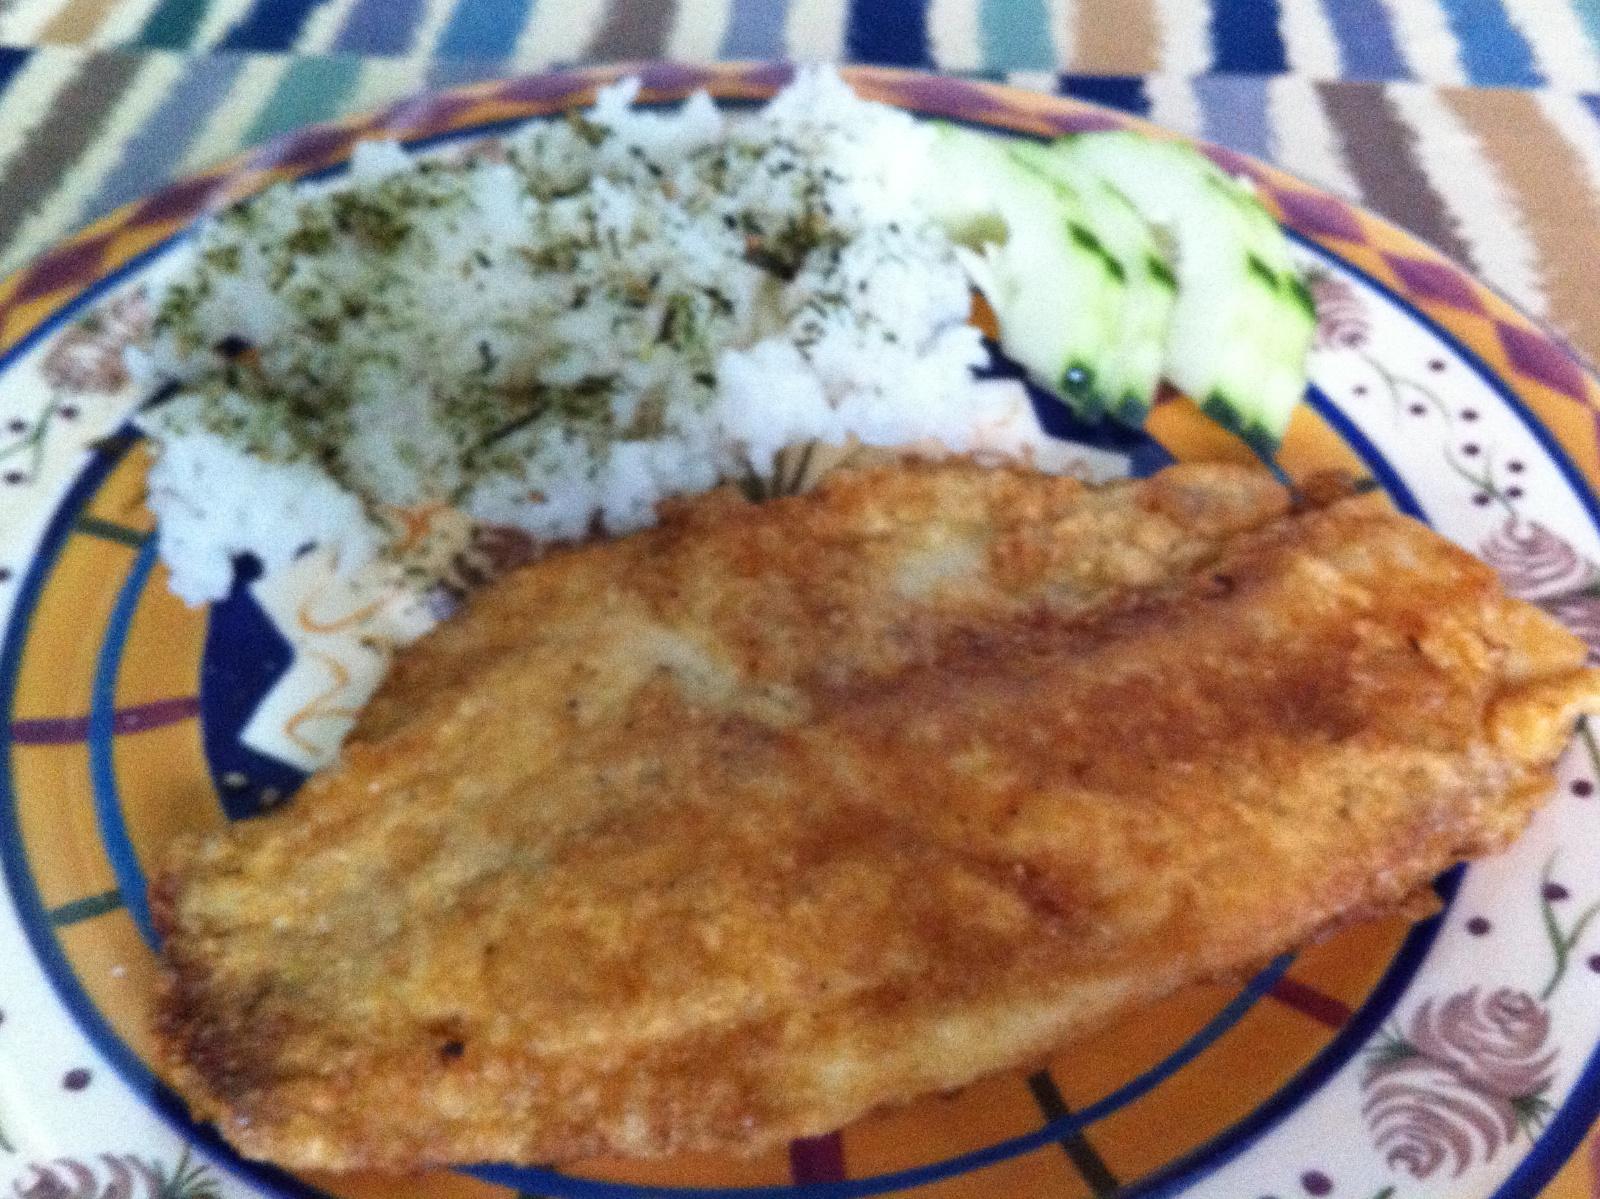 http://blog.rickk.com/food/2011/09/01/ate.2011.09.01.l.jpg